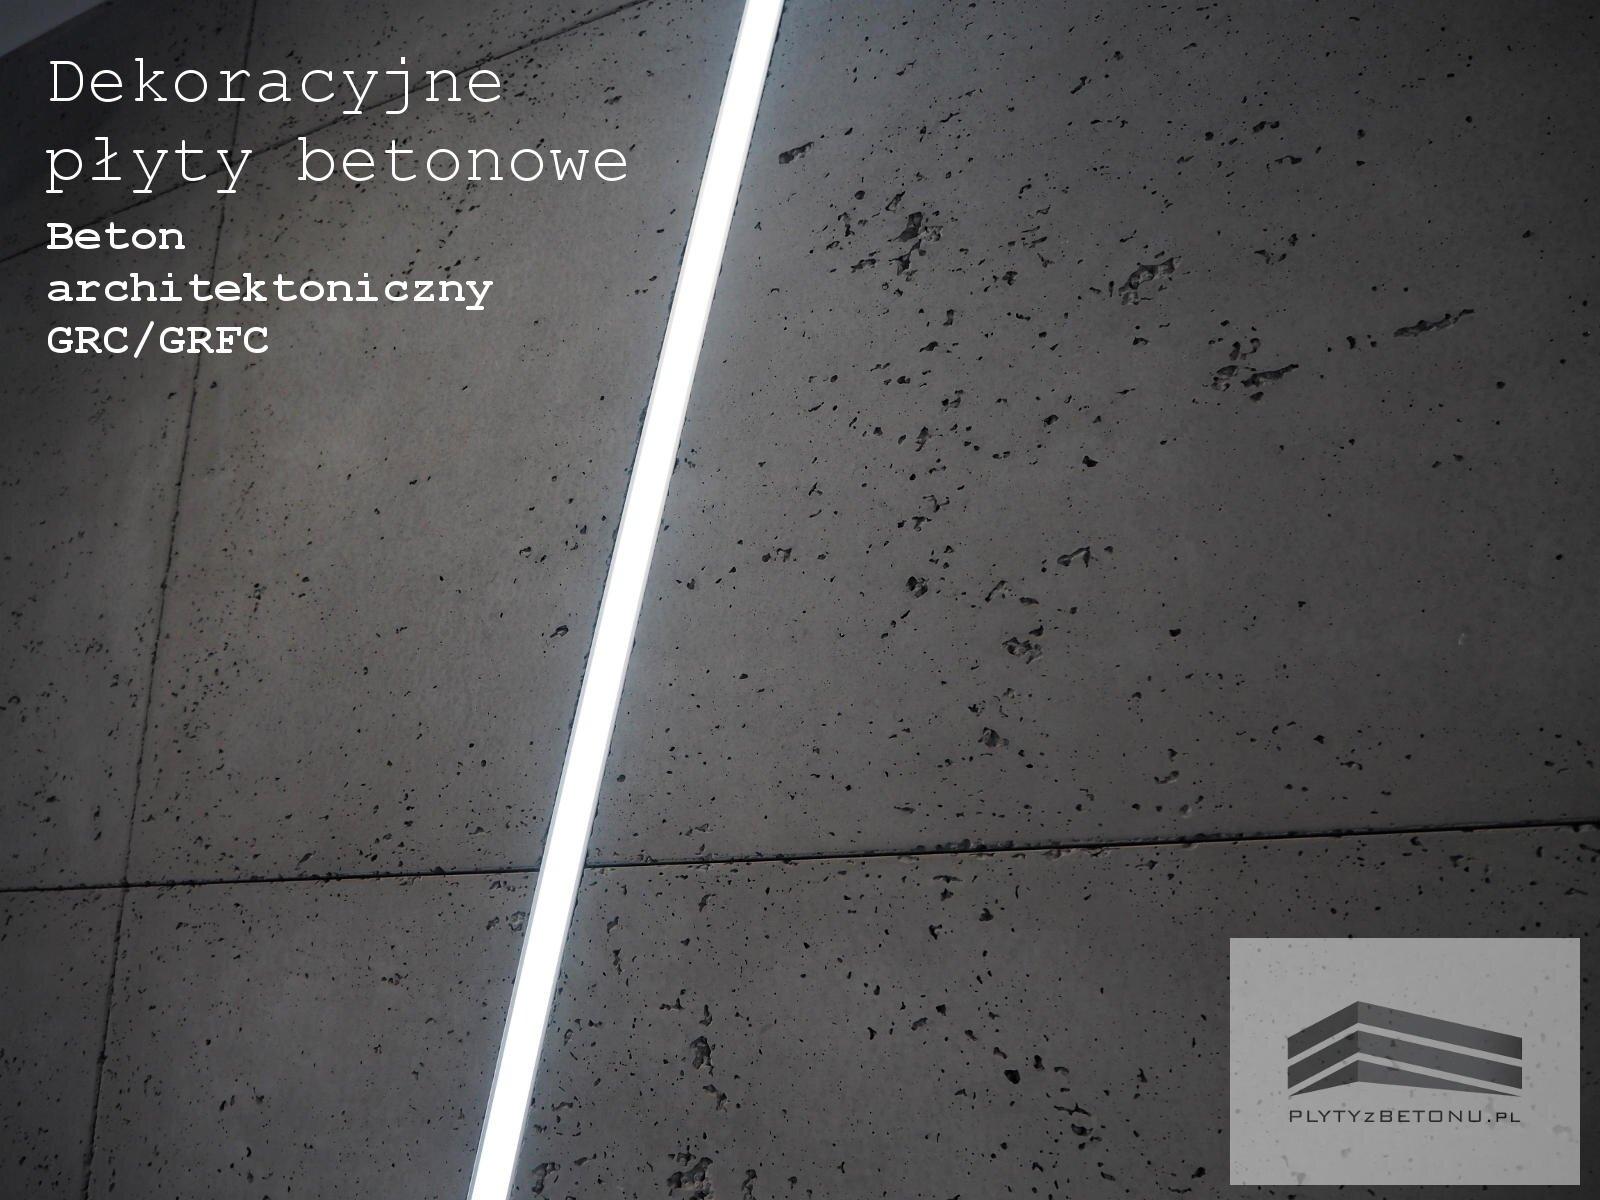 Plyty betonowe Beton architektoniczny GRC GRFC1